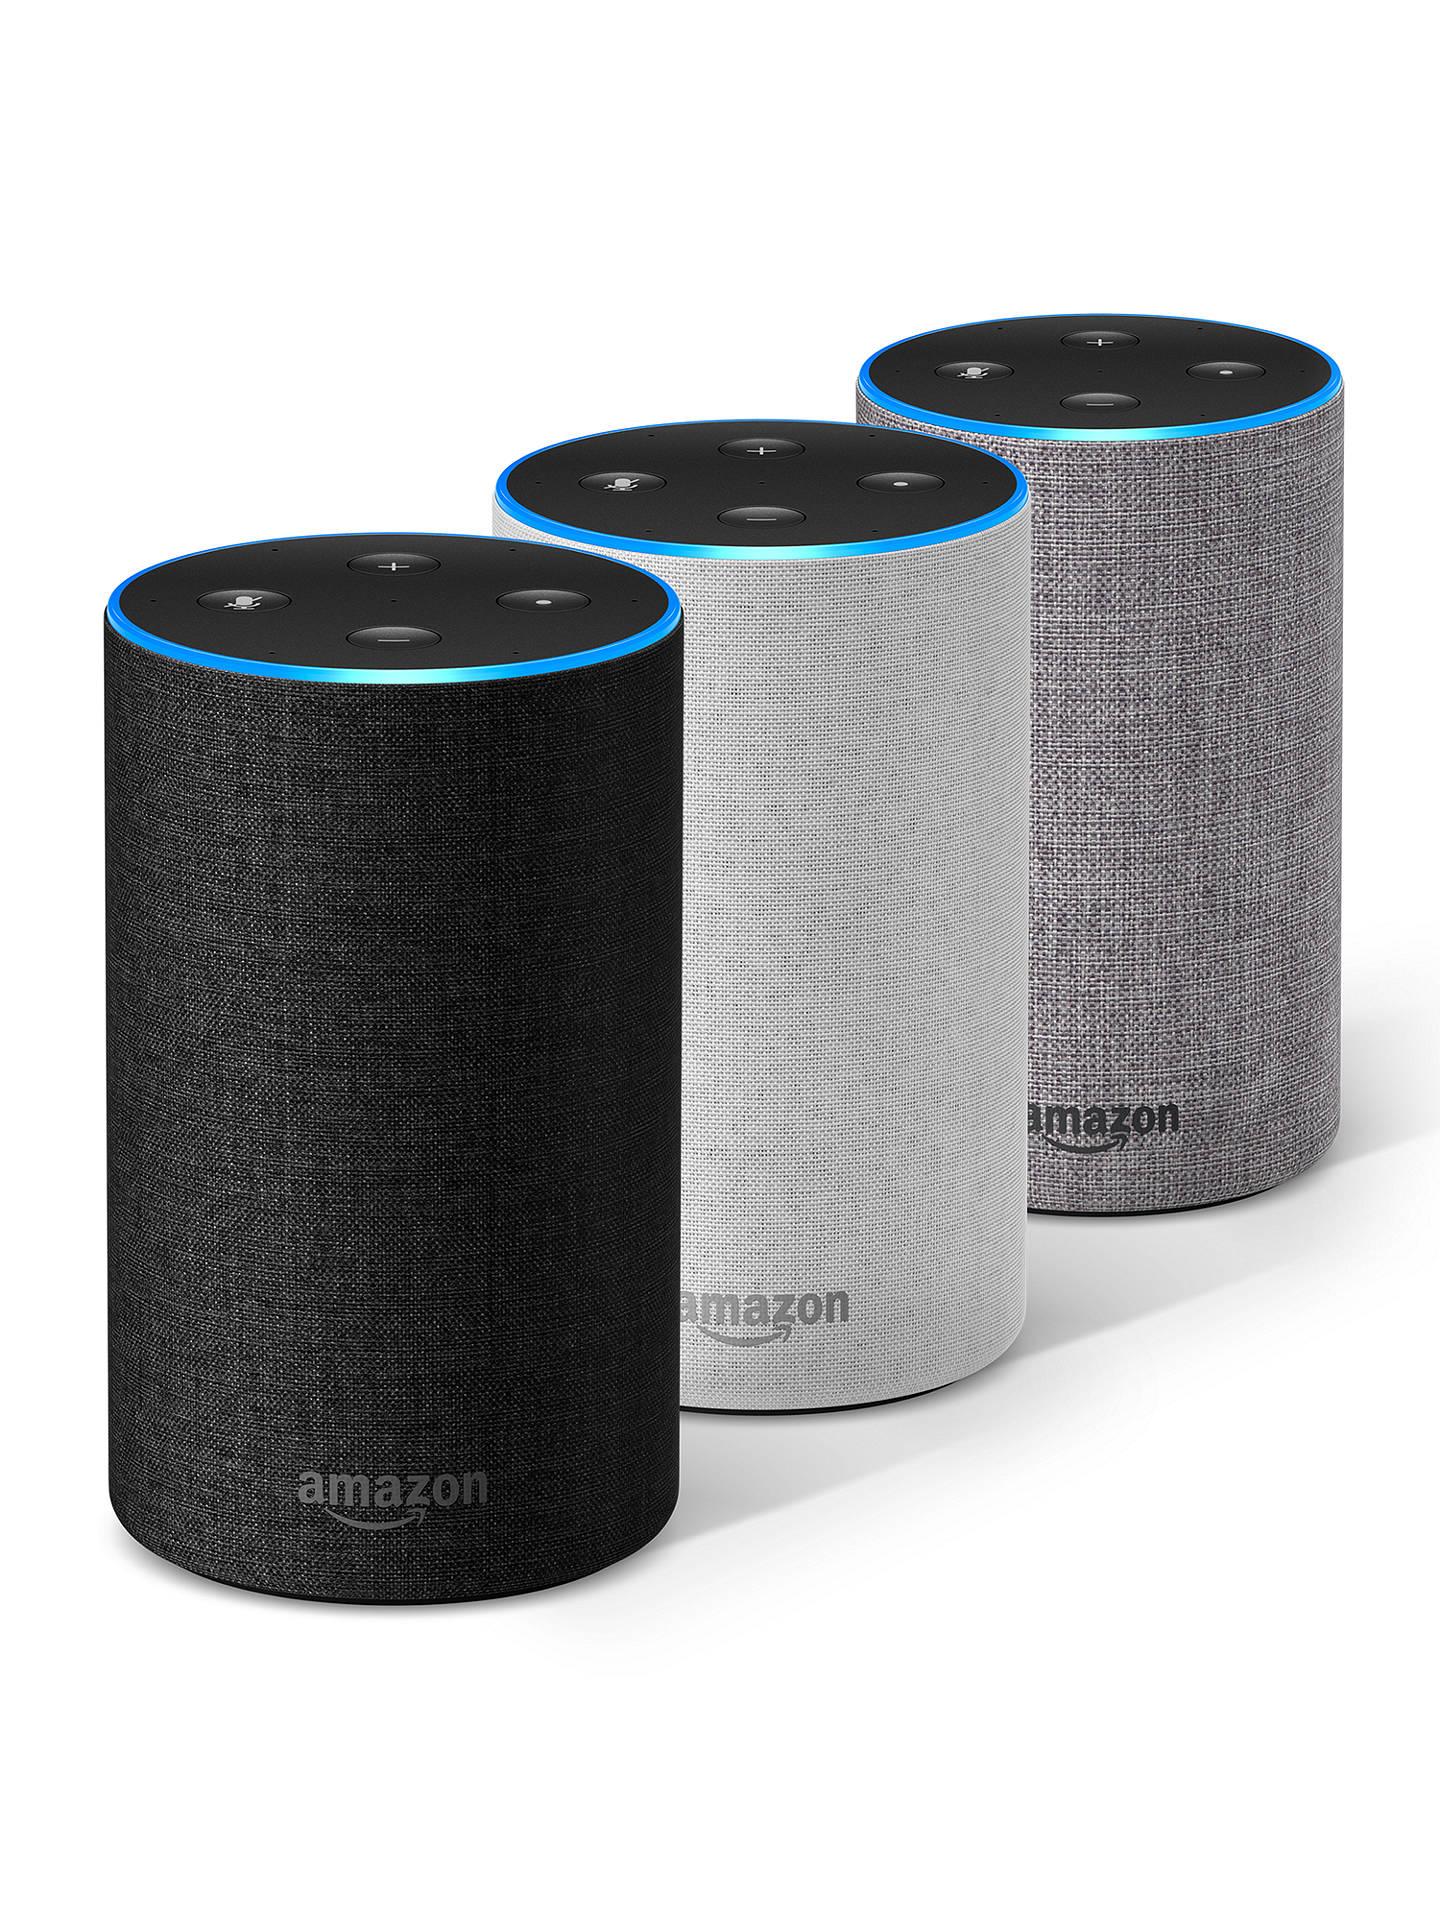 amazon echo smart speaker with alexa voice recognition. Black Bedroom Furniture Sets. Home Design Ideas